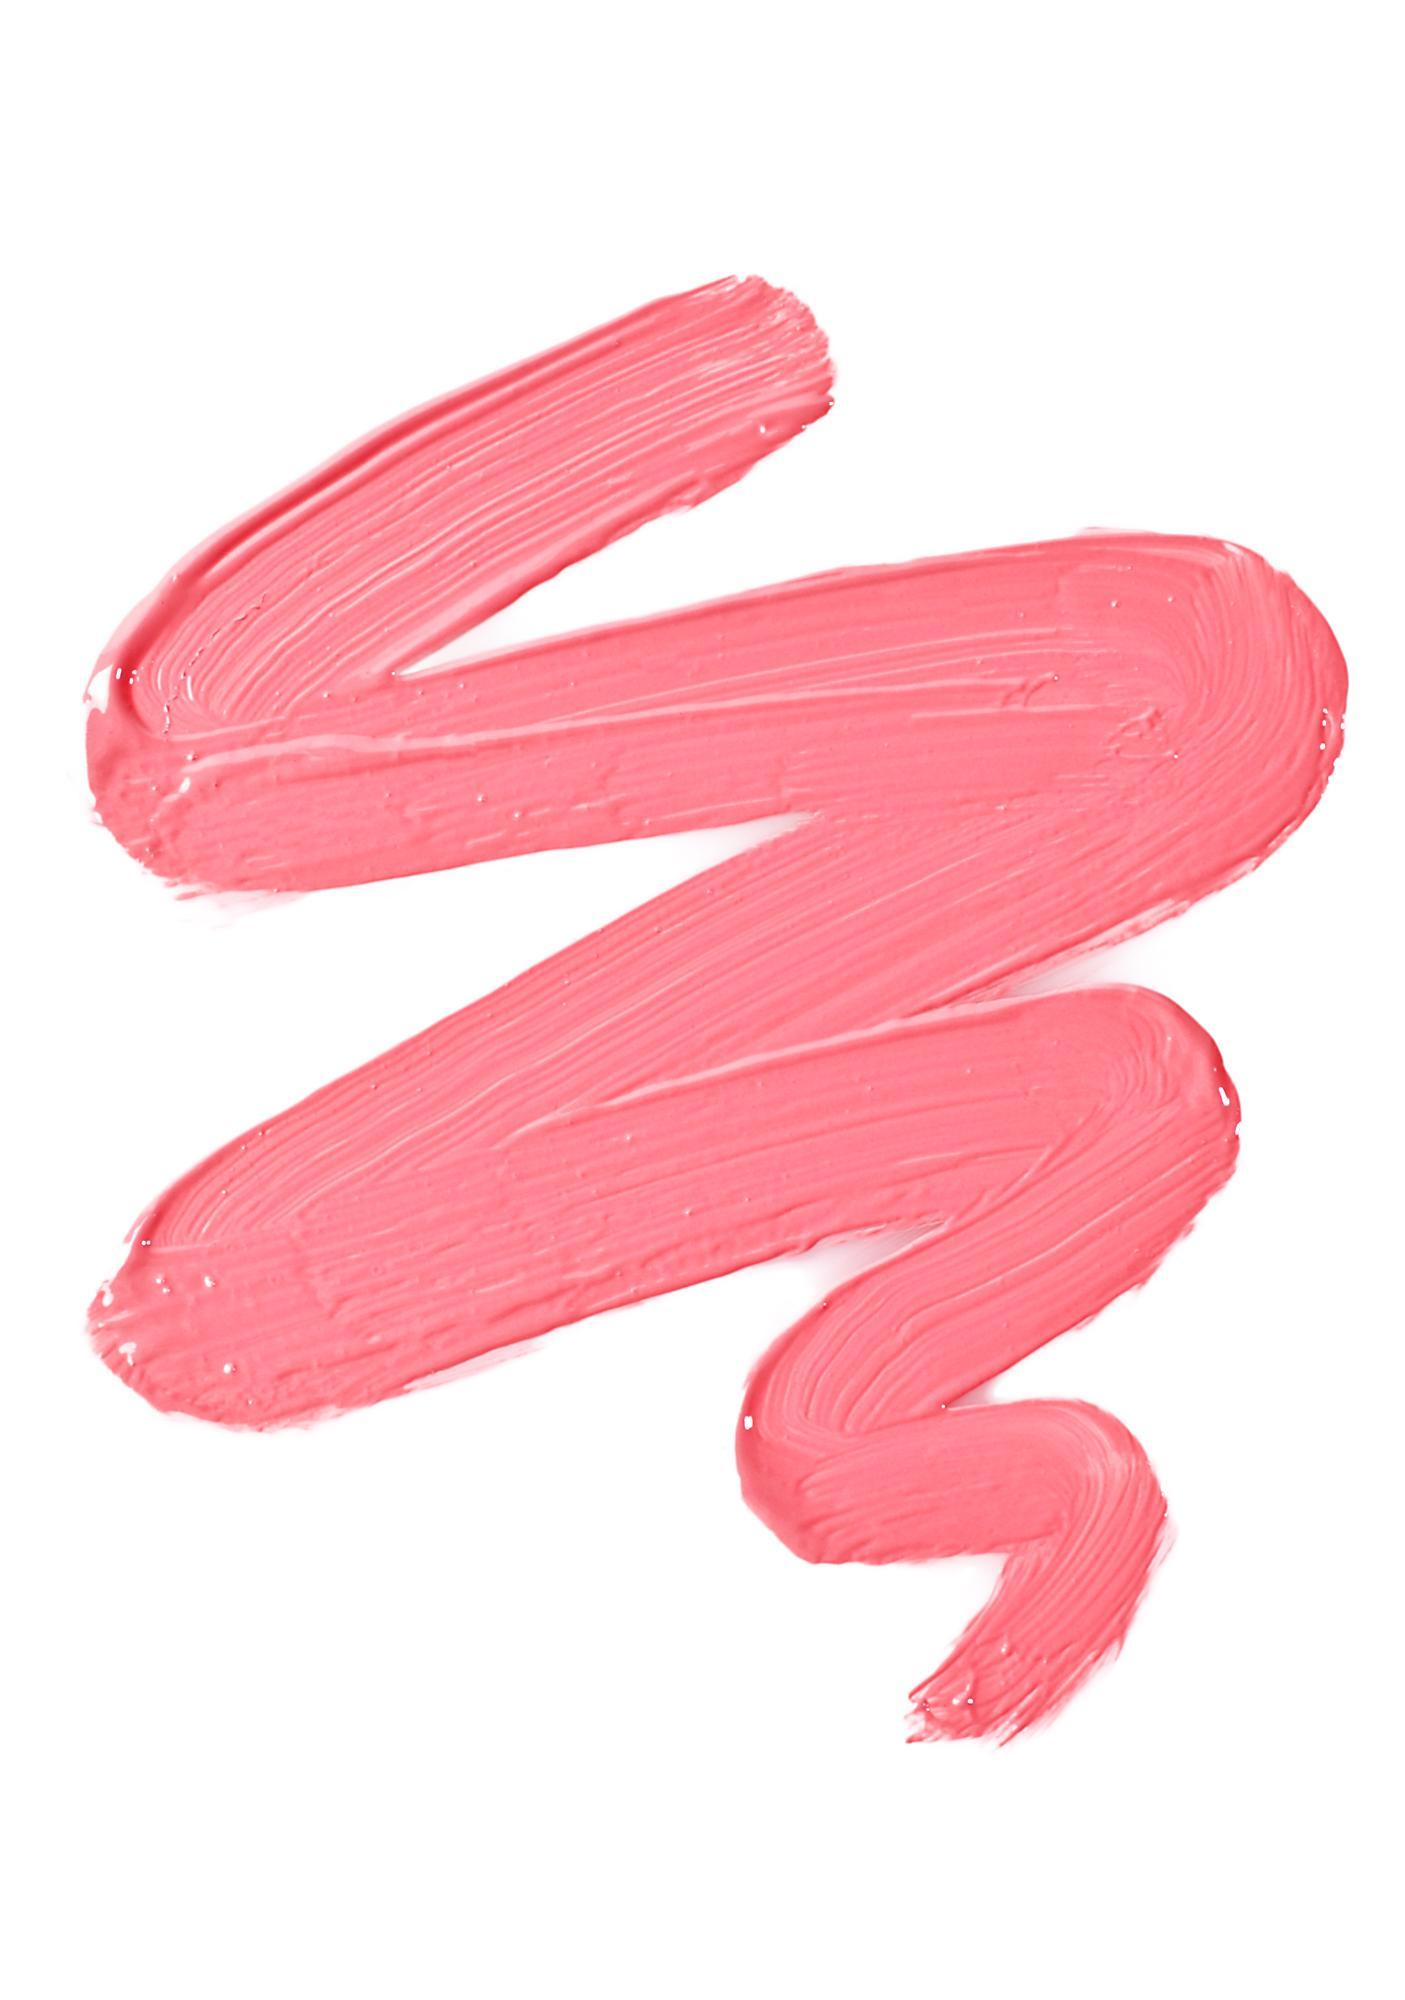 Sigma Rosette Lip Eclipse Gloss